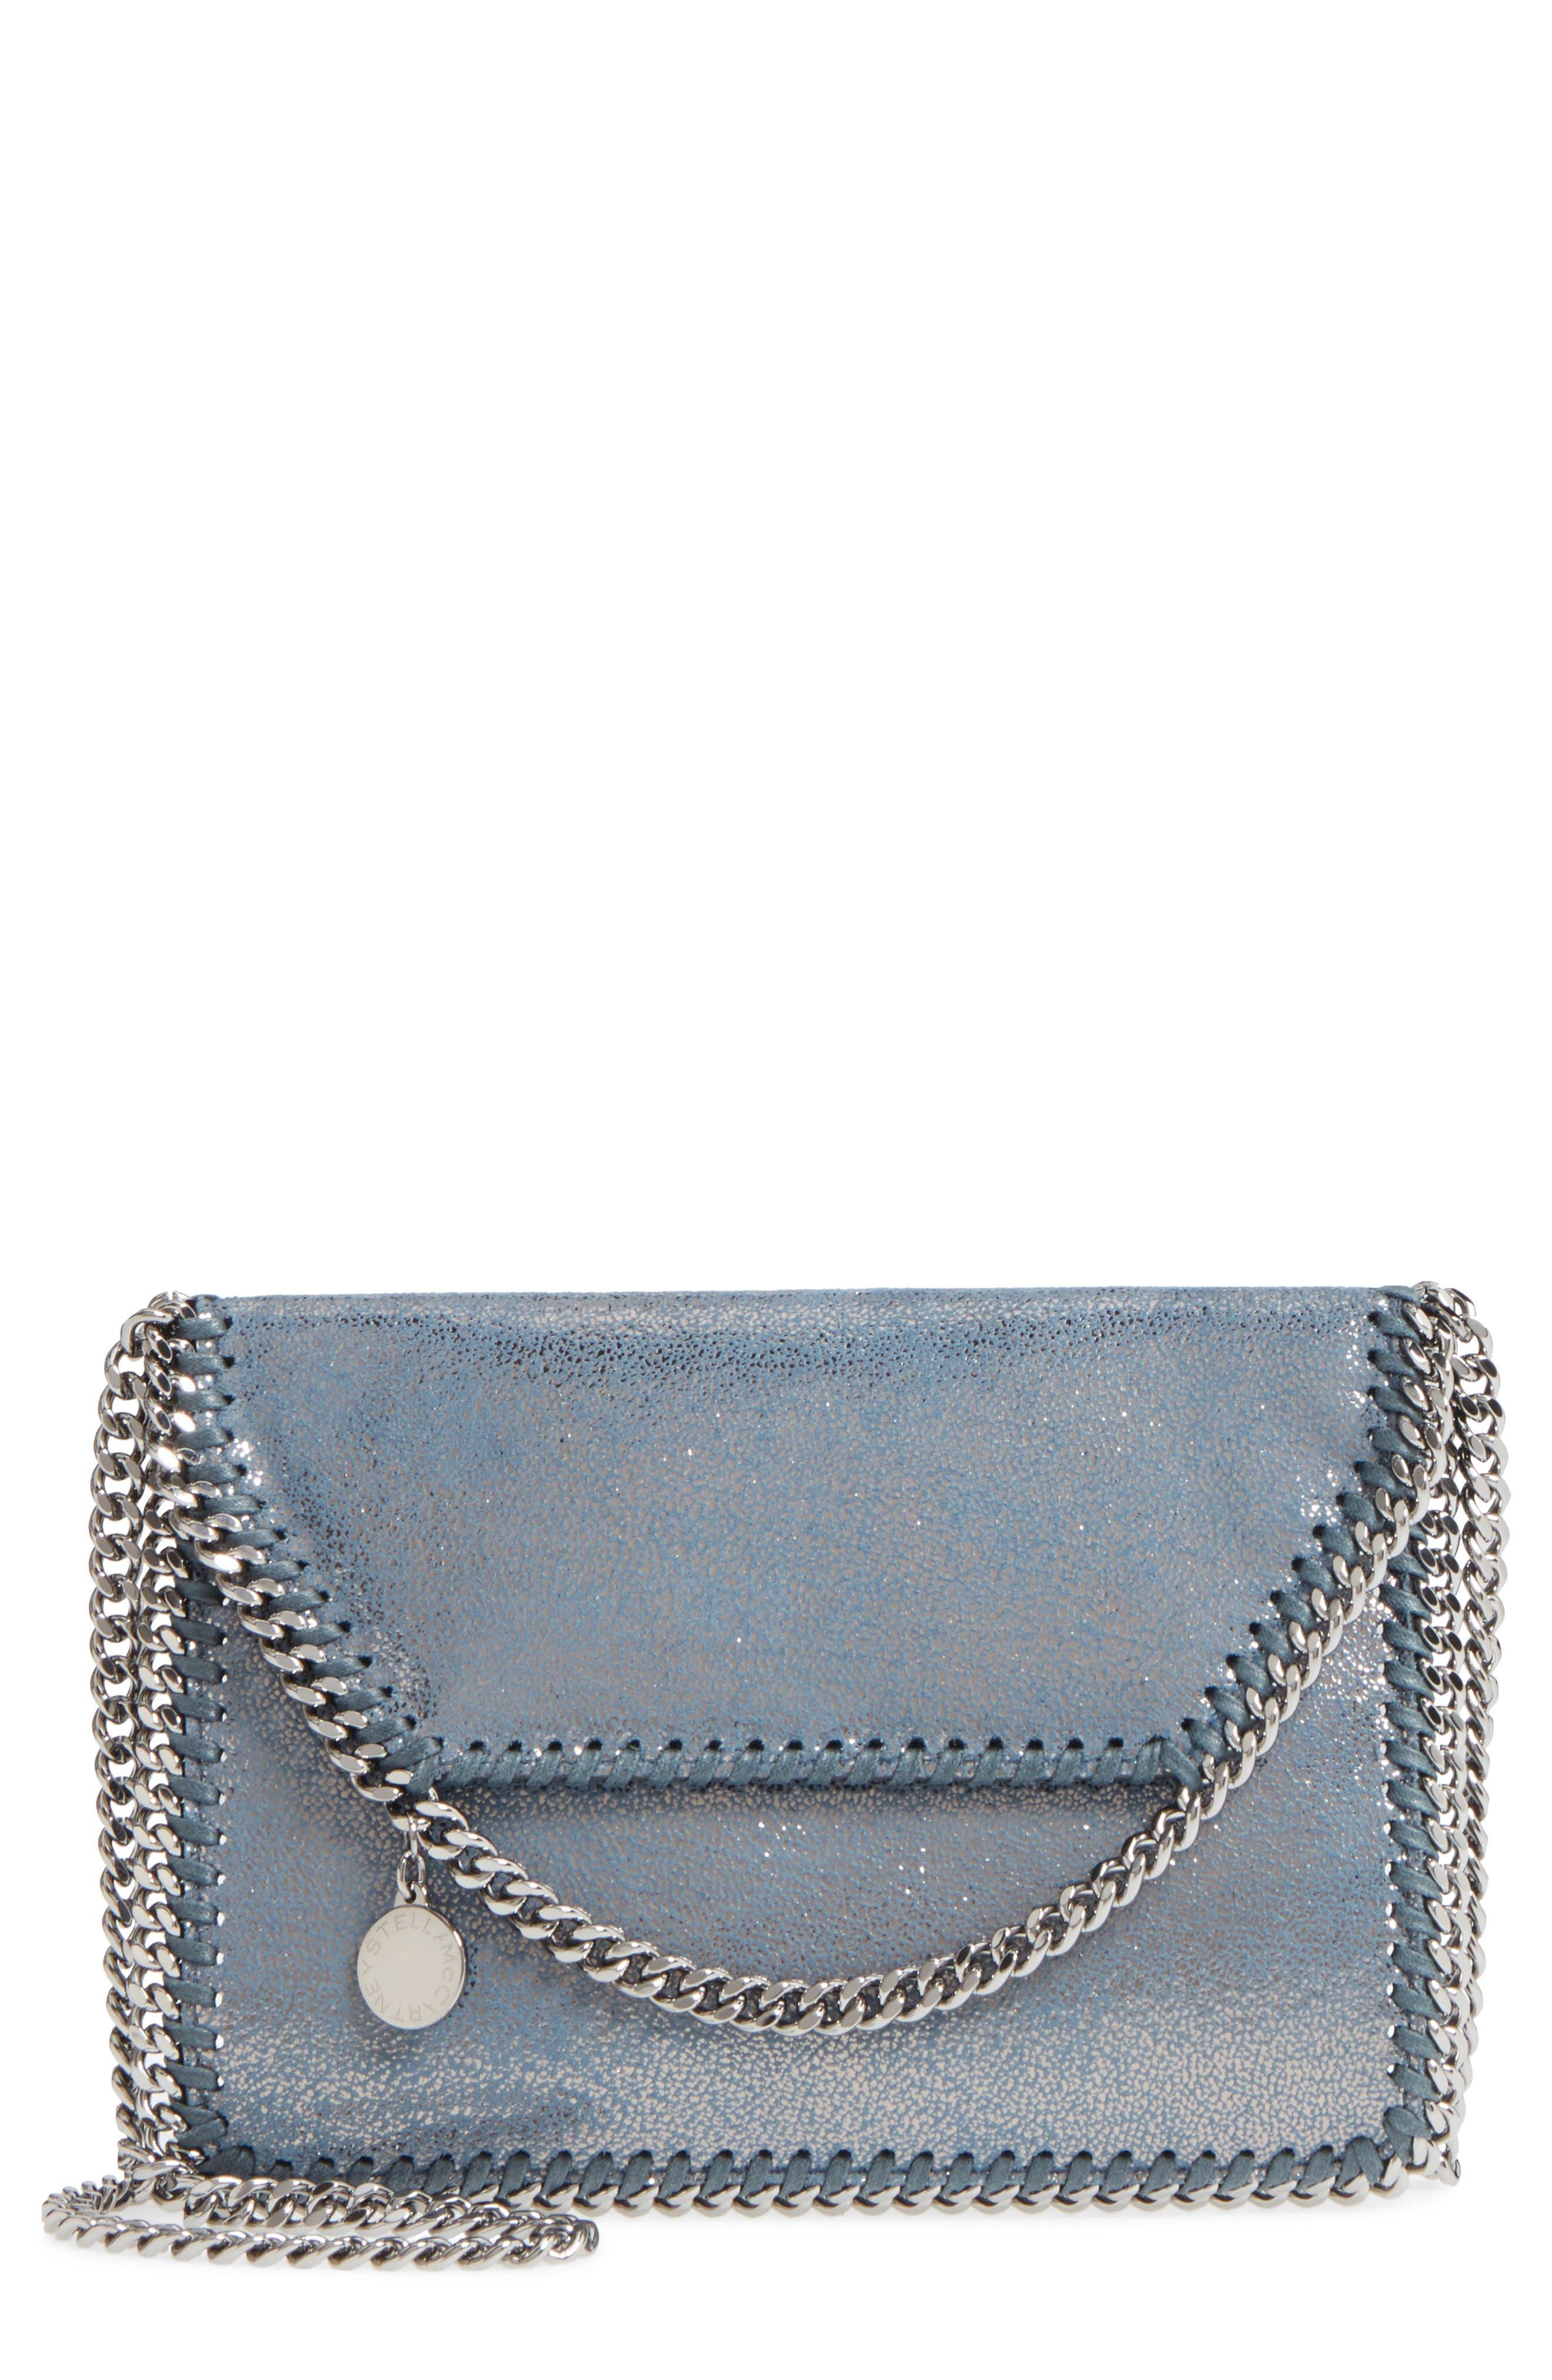 Main Image - Stella McCartney Metallic Faux Leather Crossbody Bag